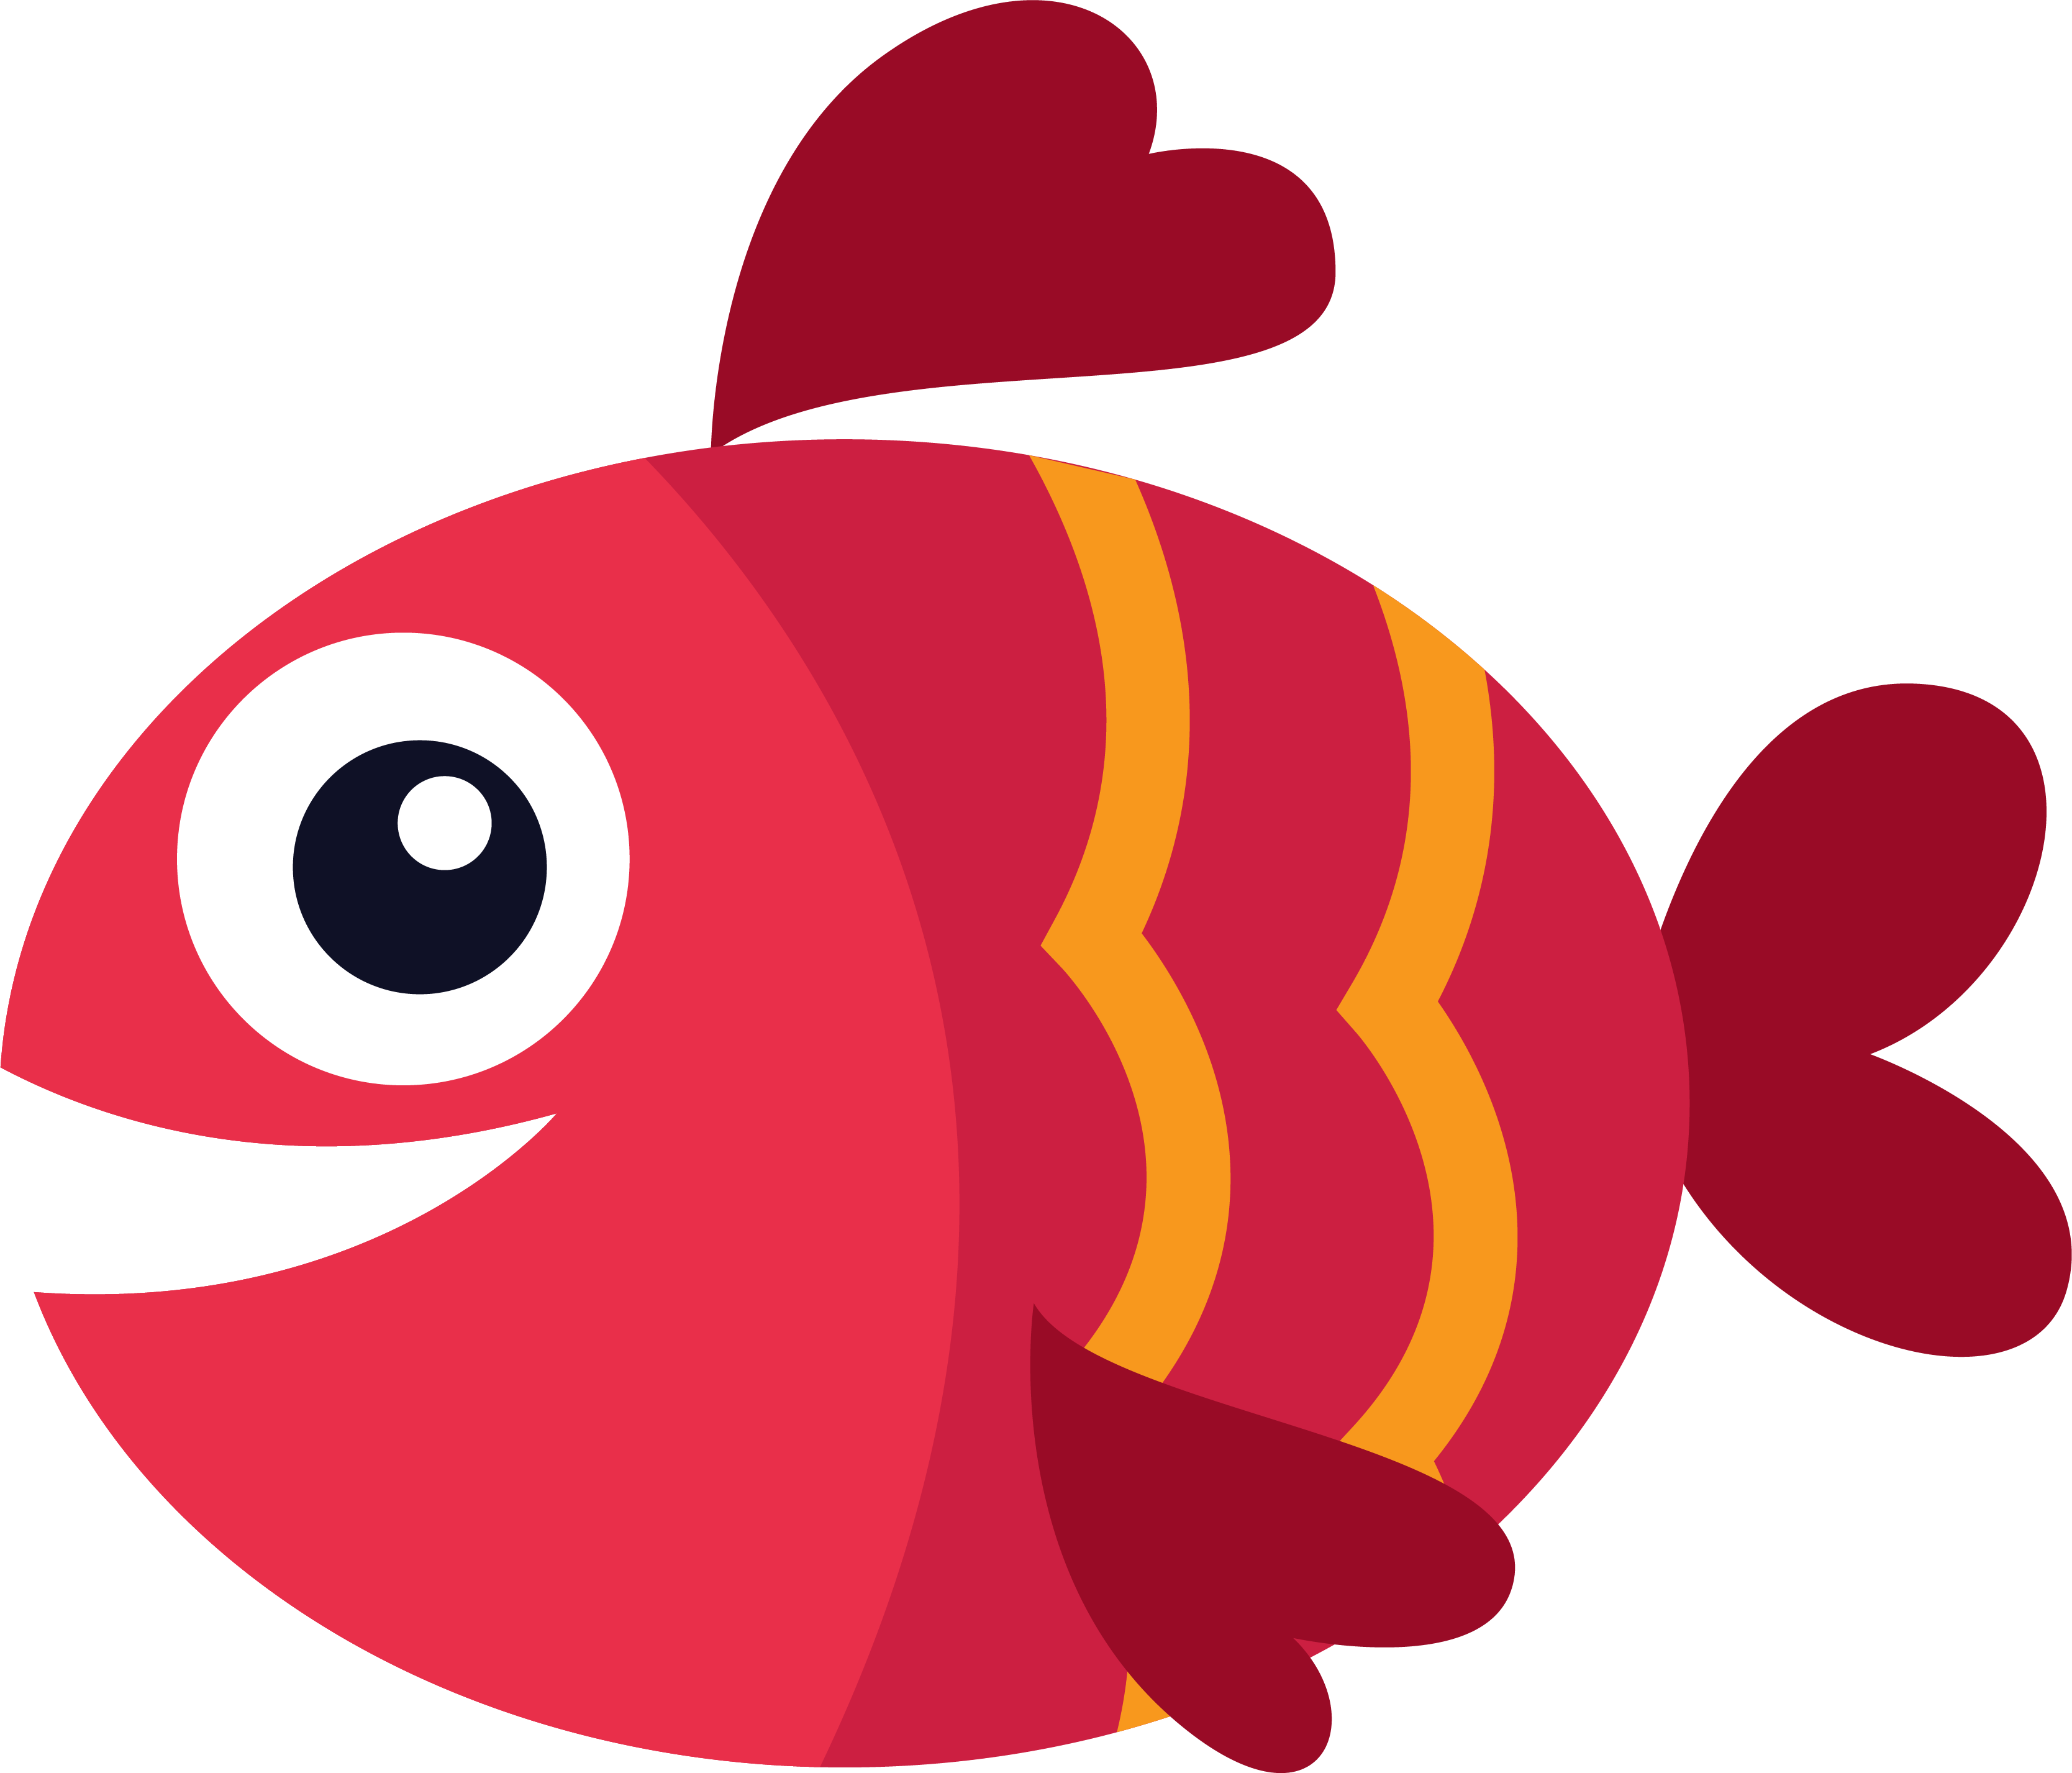 cartoon fish clipart at getdrawings com free for personal use rh getdrawings com fish pic clipart christian fish image clipart